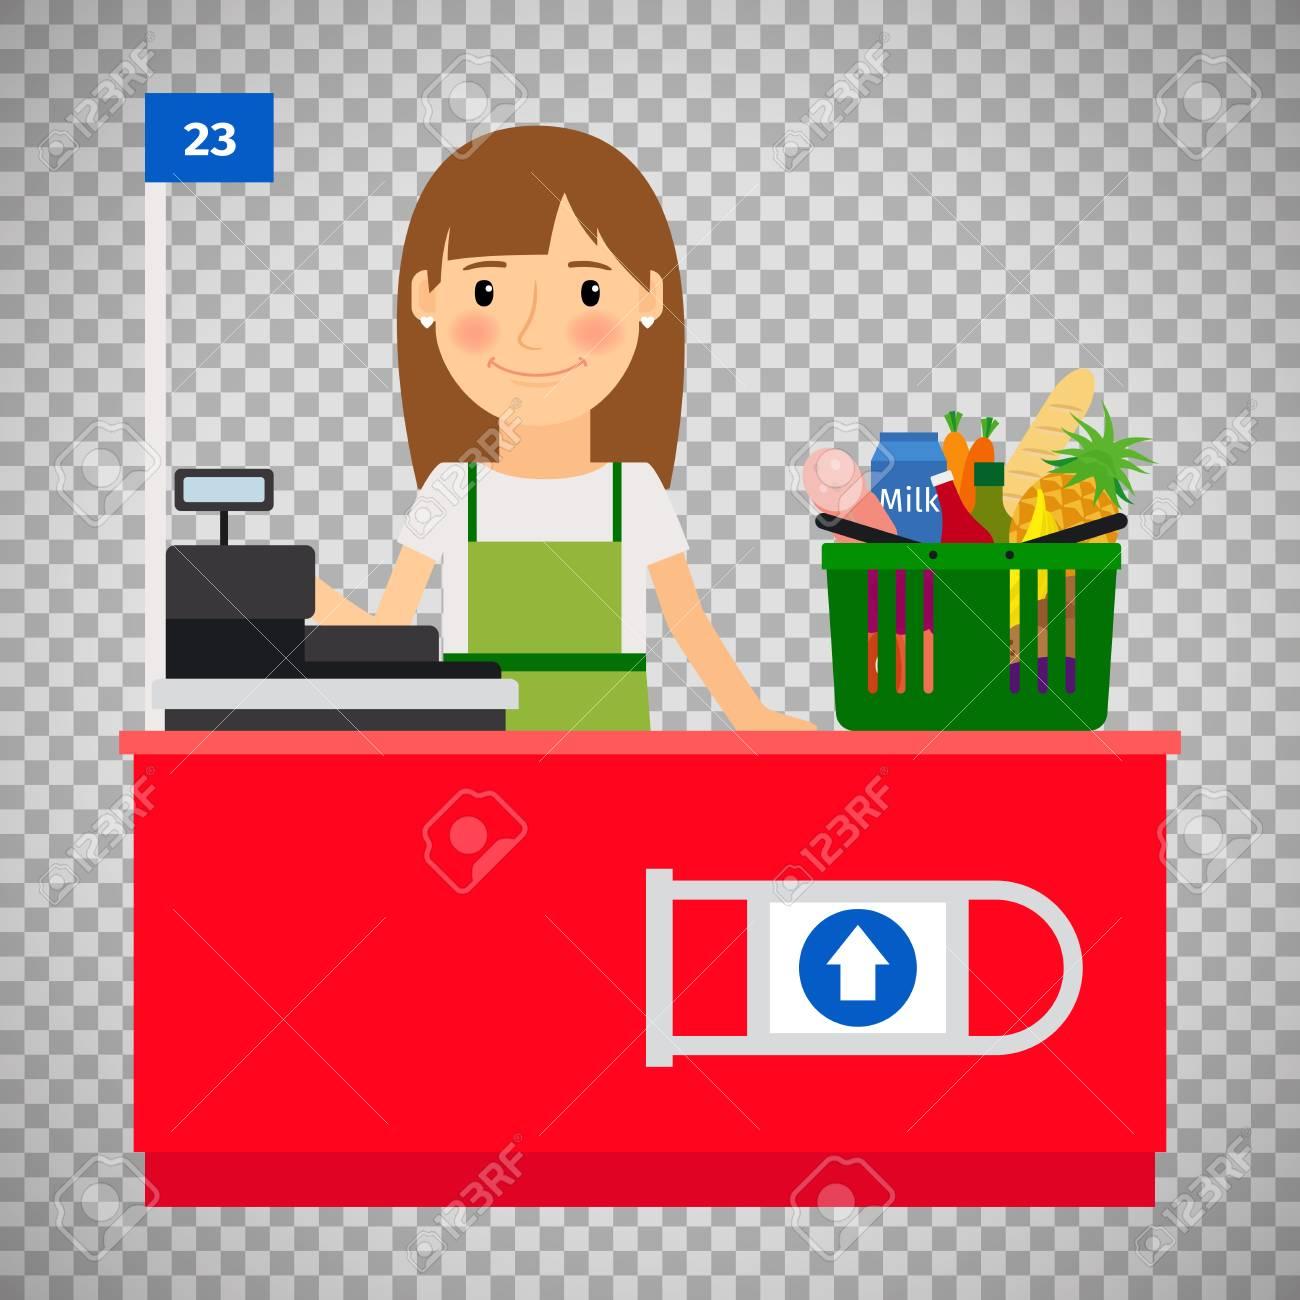 Cashier clipart transparent. Lady on background station